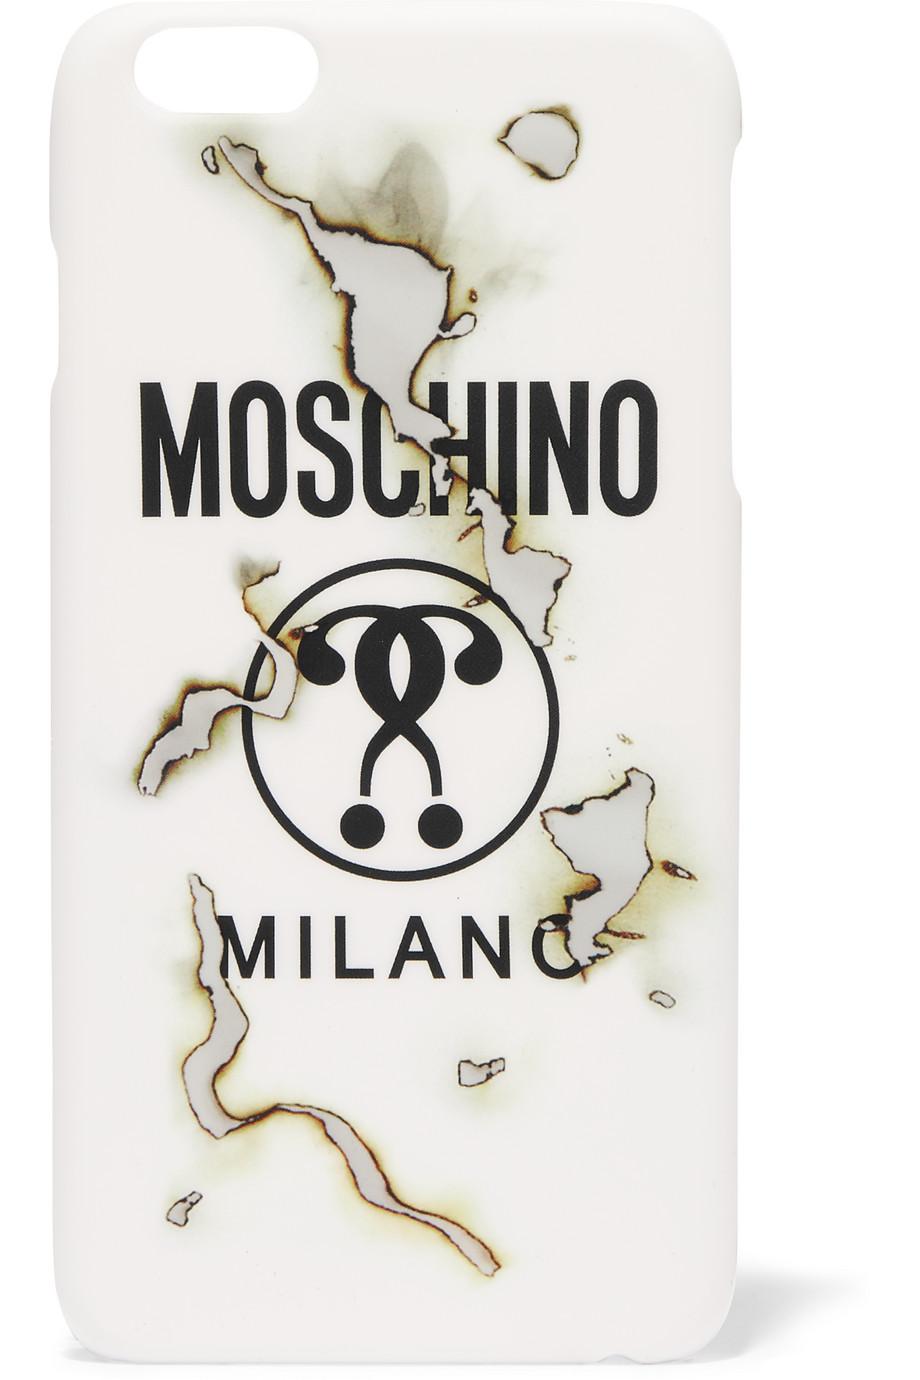 Moschino Printed Acrylic Iphone 6+ Case